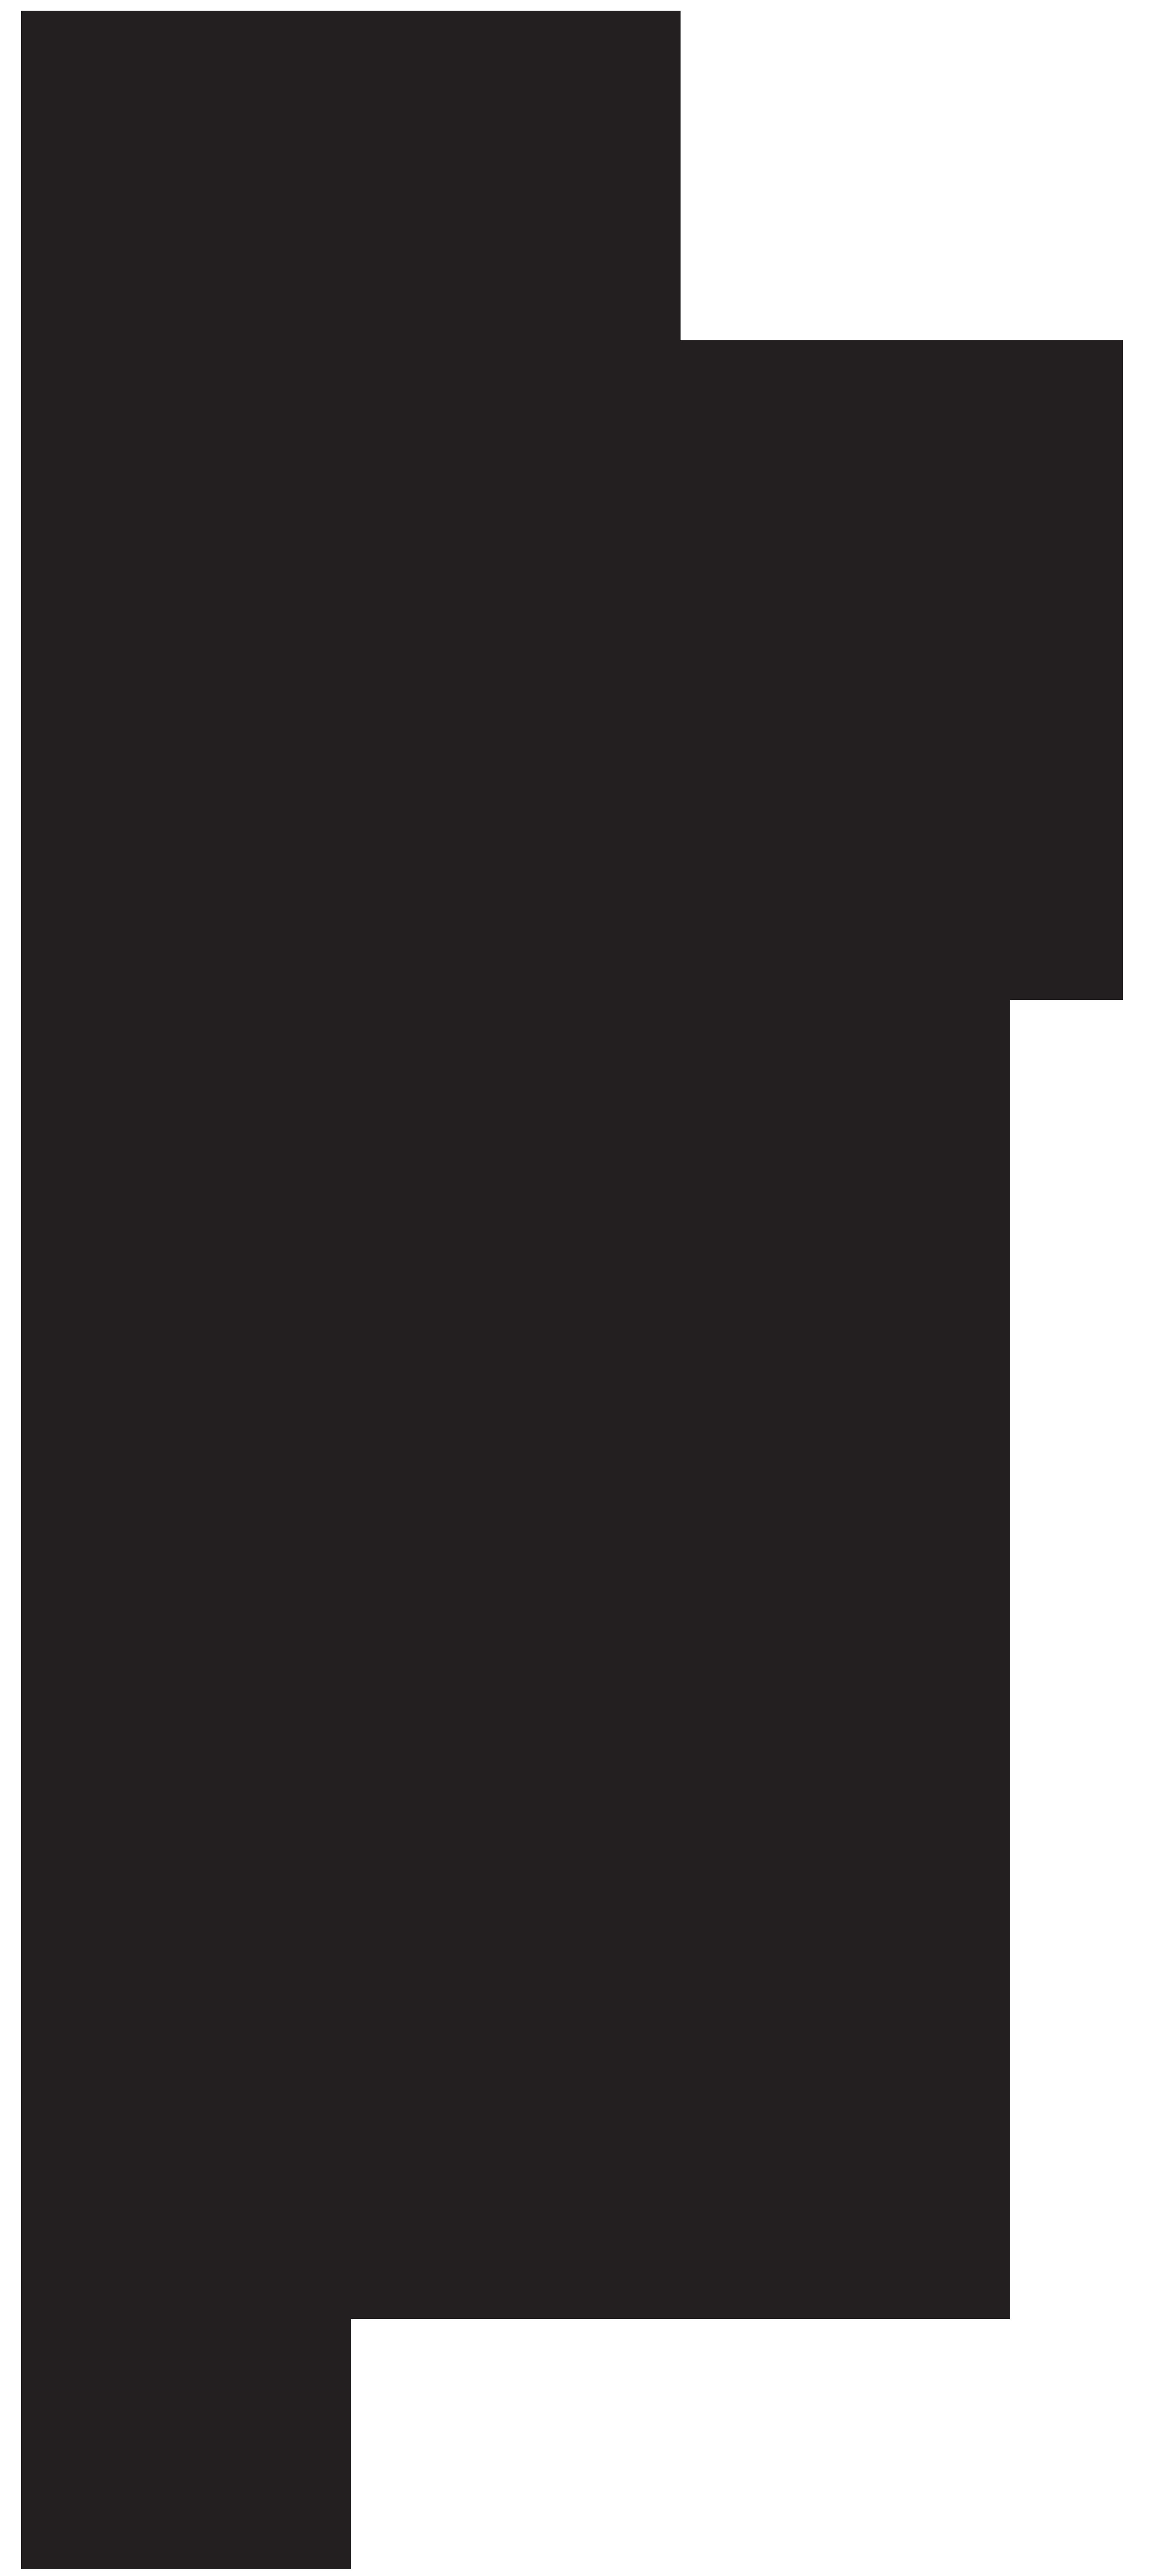 Baseball Player Silhouette Clip Art Image.